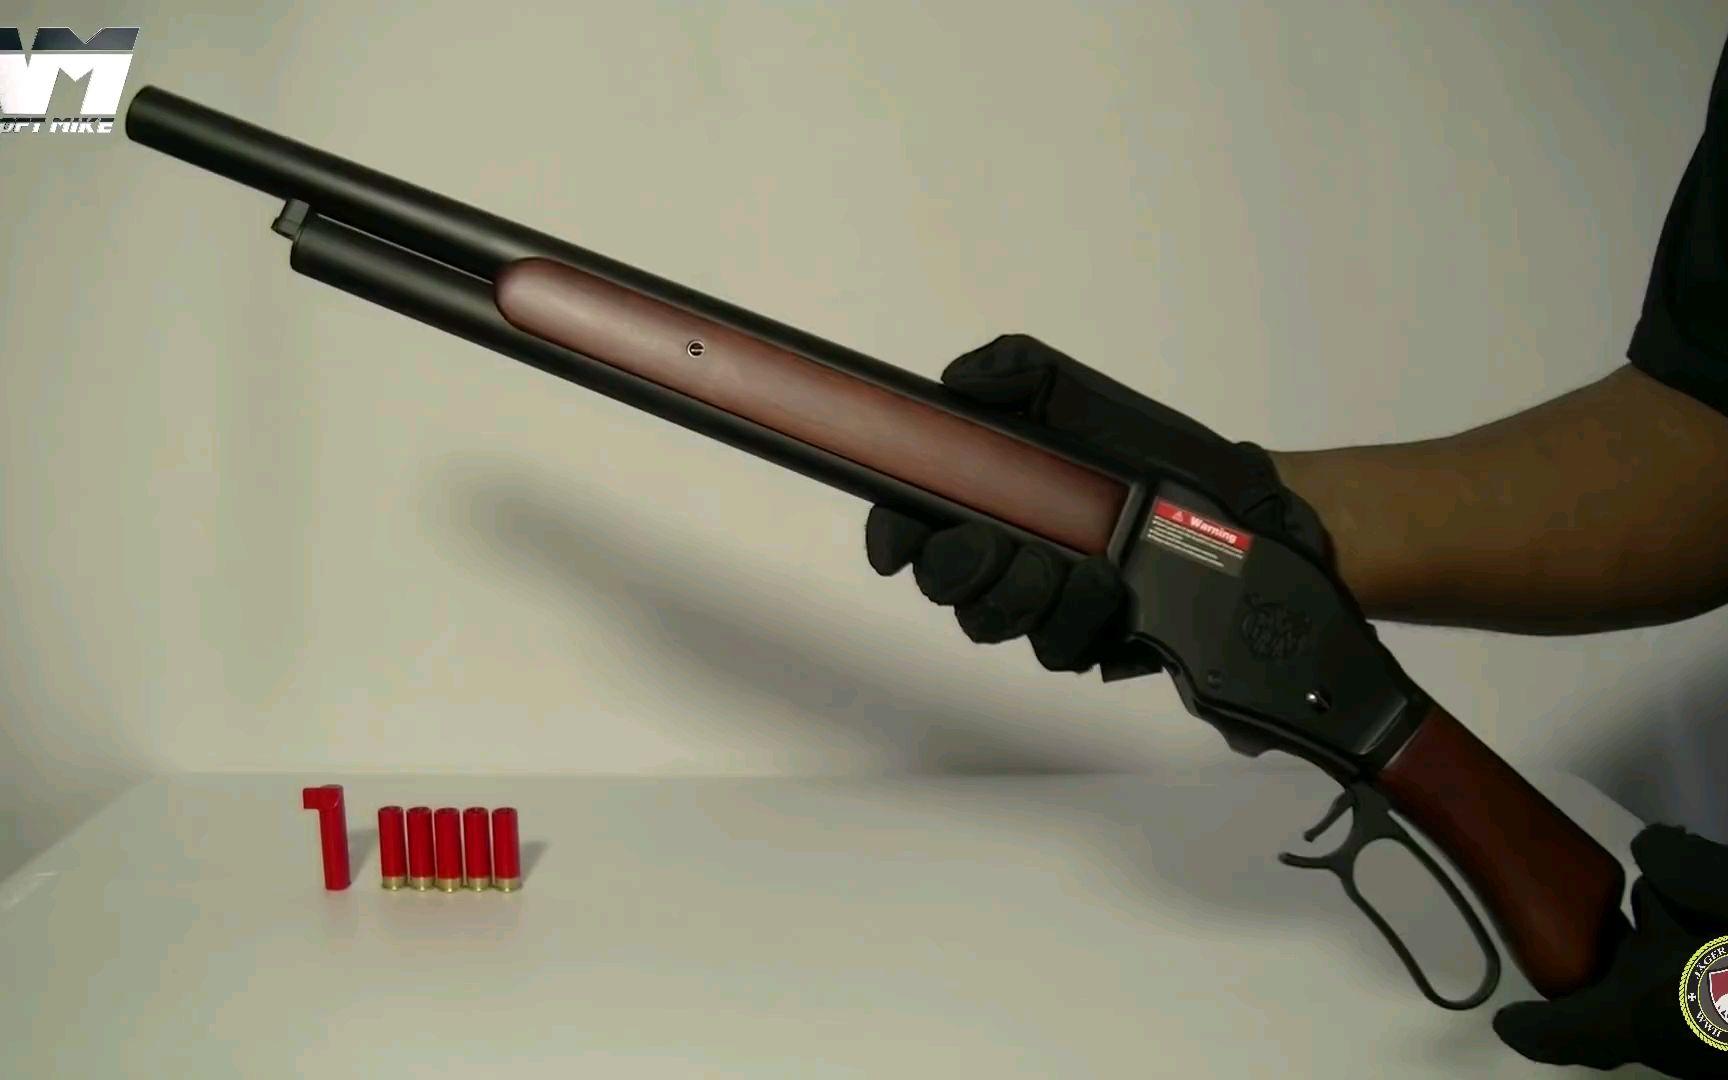 【Airsoft Mike】S&T 温彻斯特M1887 玩具枪测试